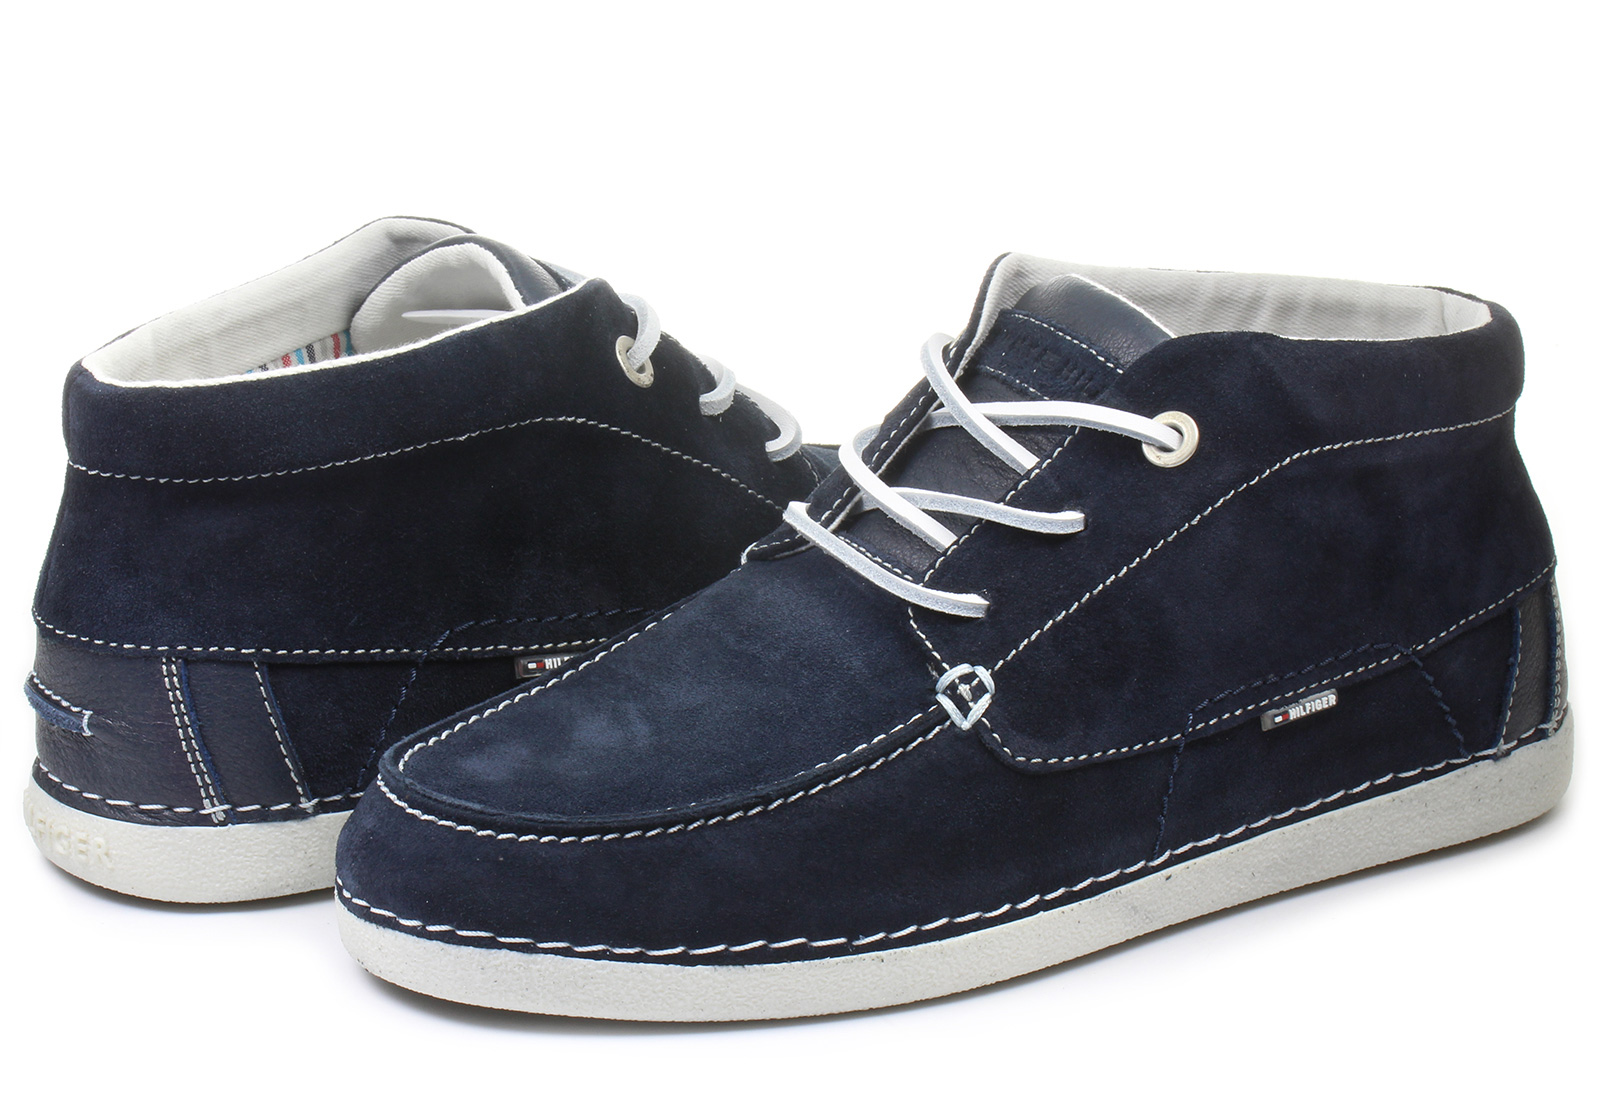 Tommy Hilfiger Cipő - Felix 2b - 14S-6966-403 - Office Shoes ... db83638de4